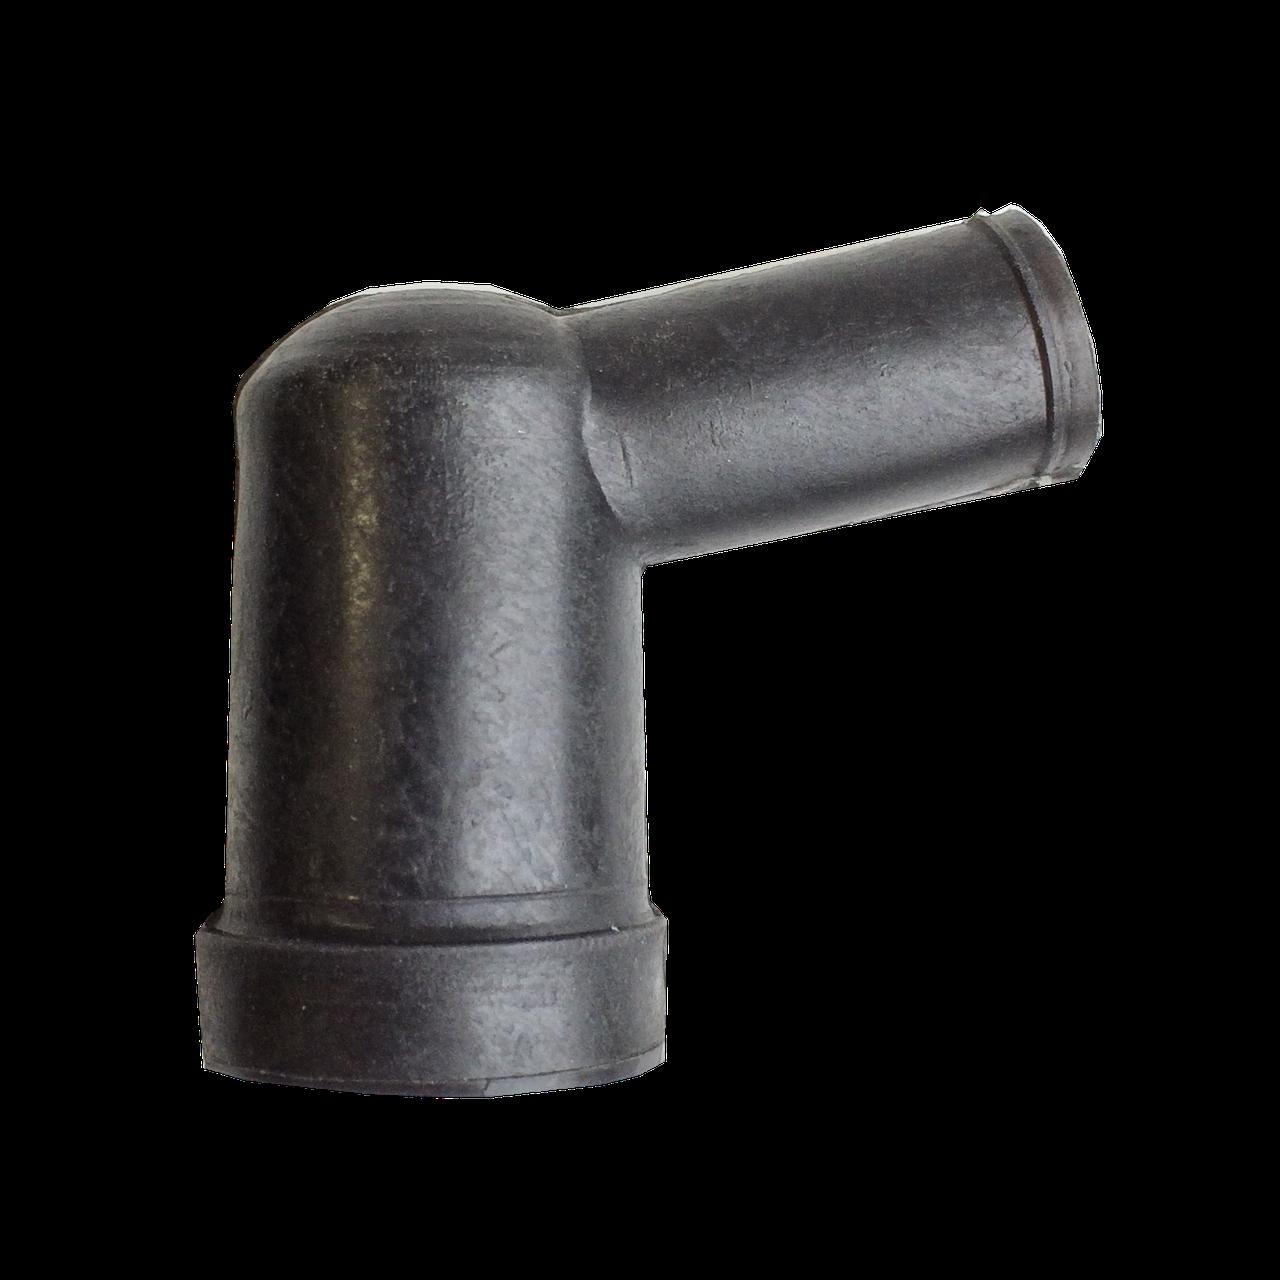 Уголок под ПВХ (на п.п крышку ведра или алюм.)